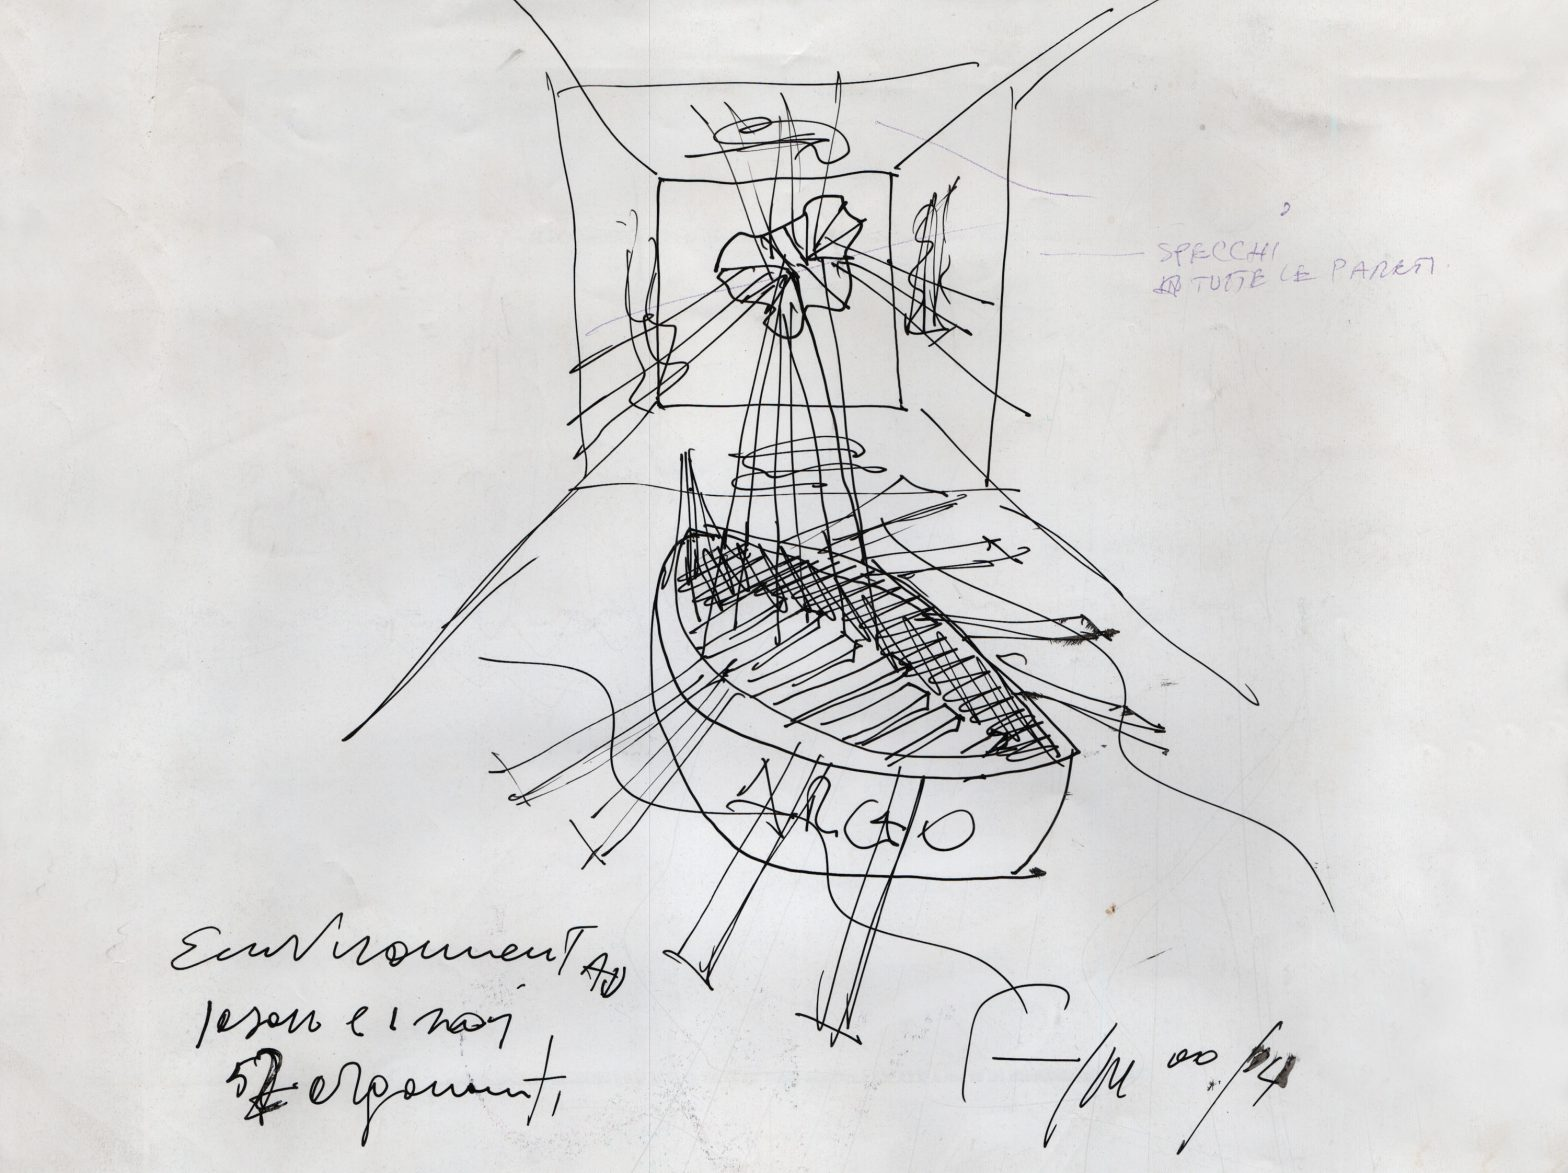 Sketch of a body of a ship inside a room.